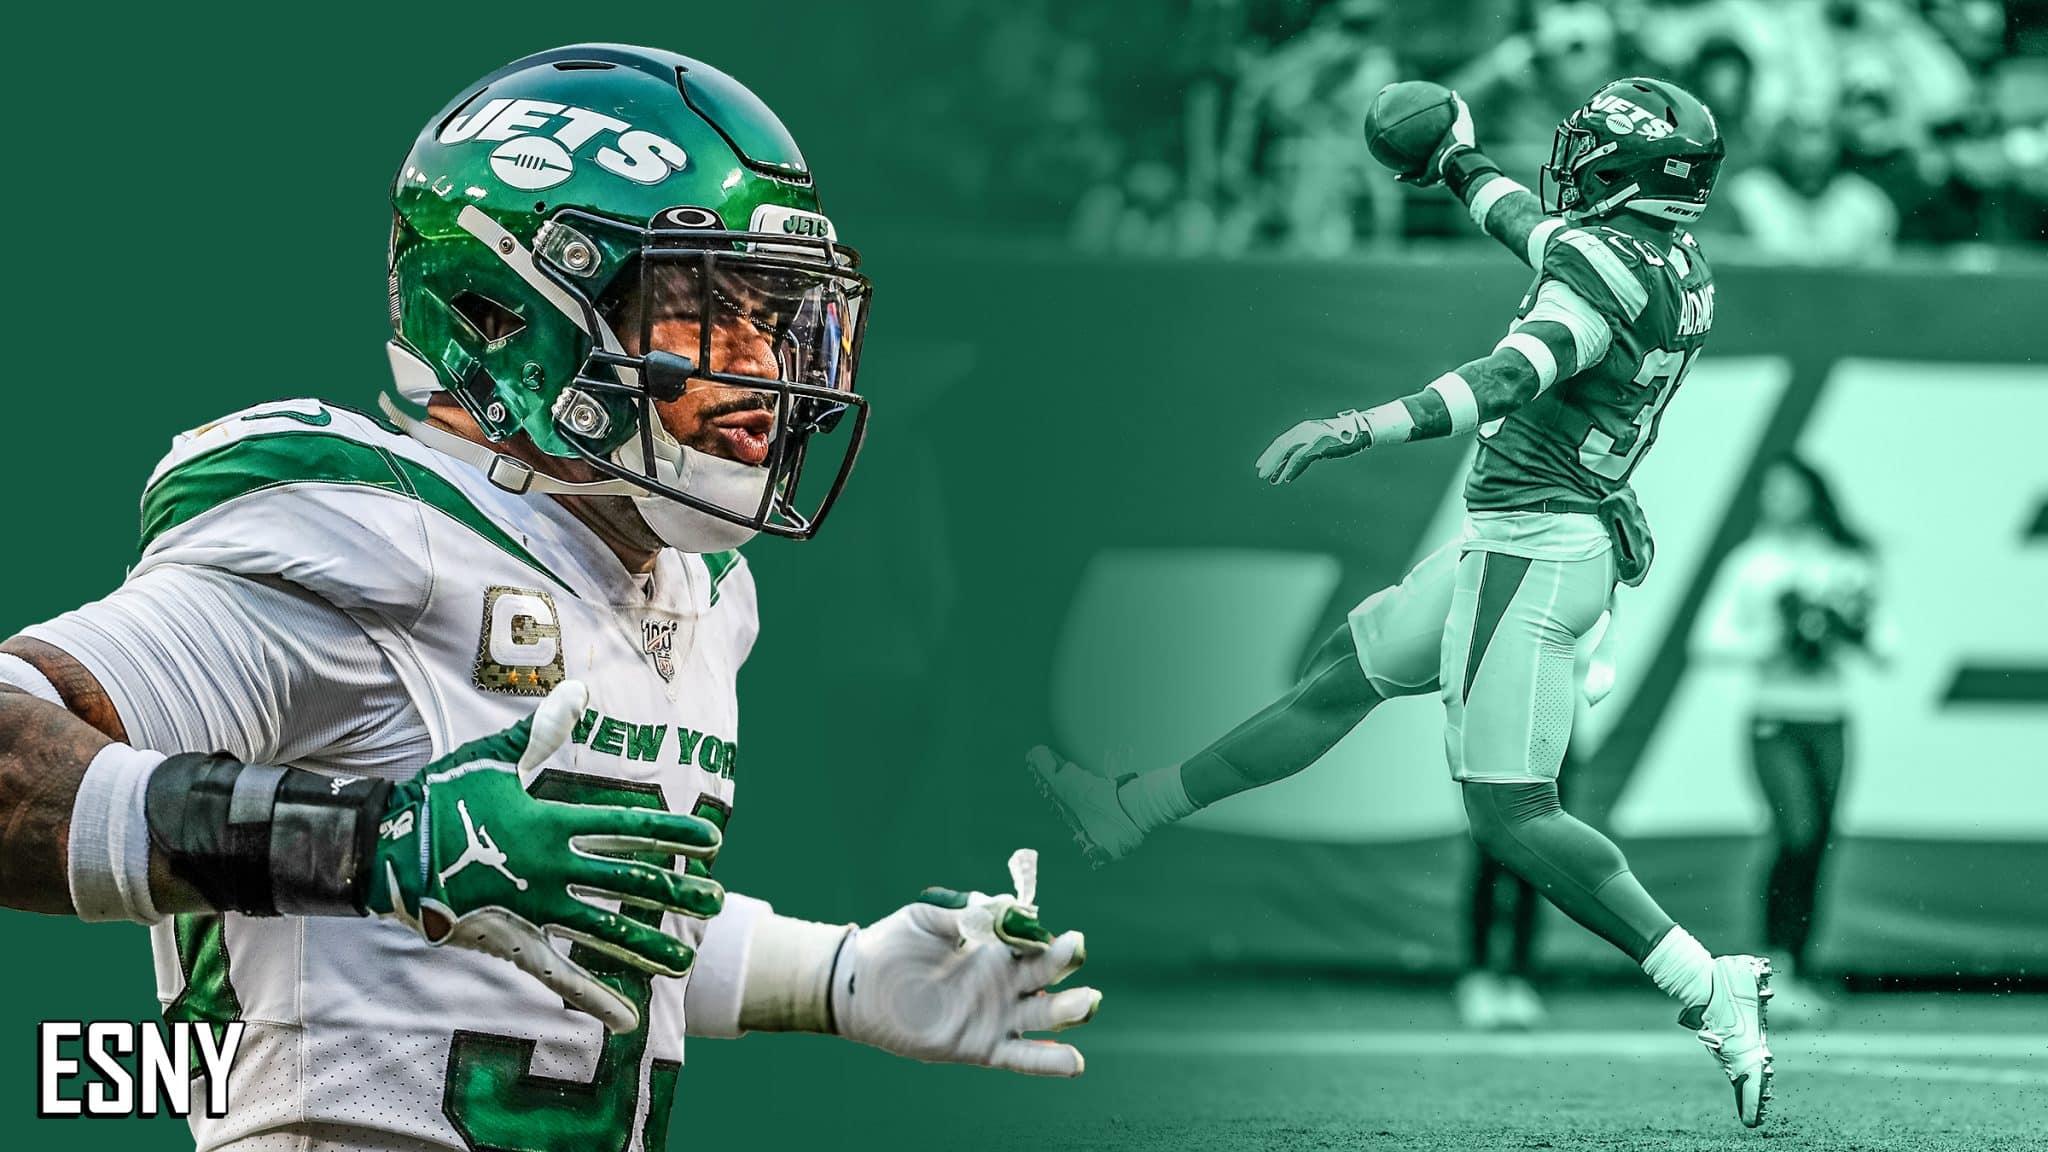 New York Jets Ss Jamal Adams Embodies The 2019 Team Mantra